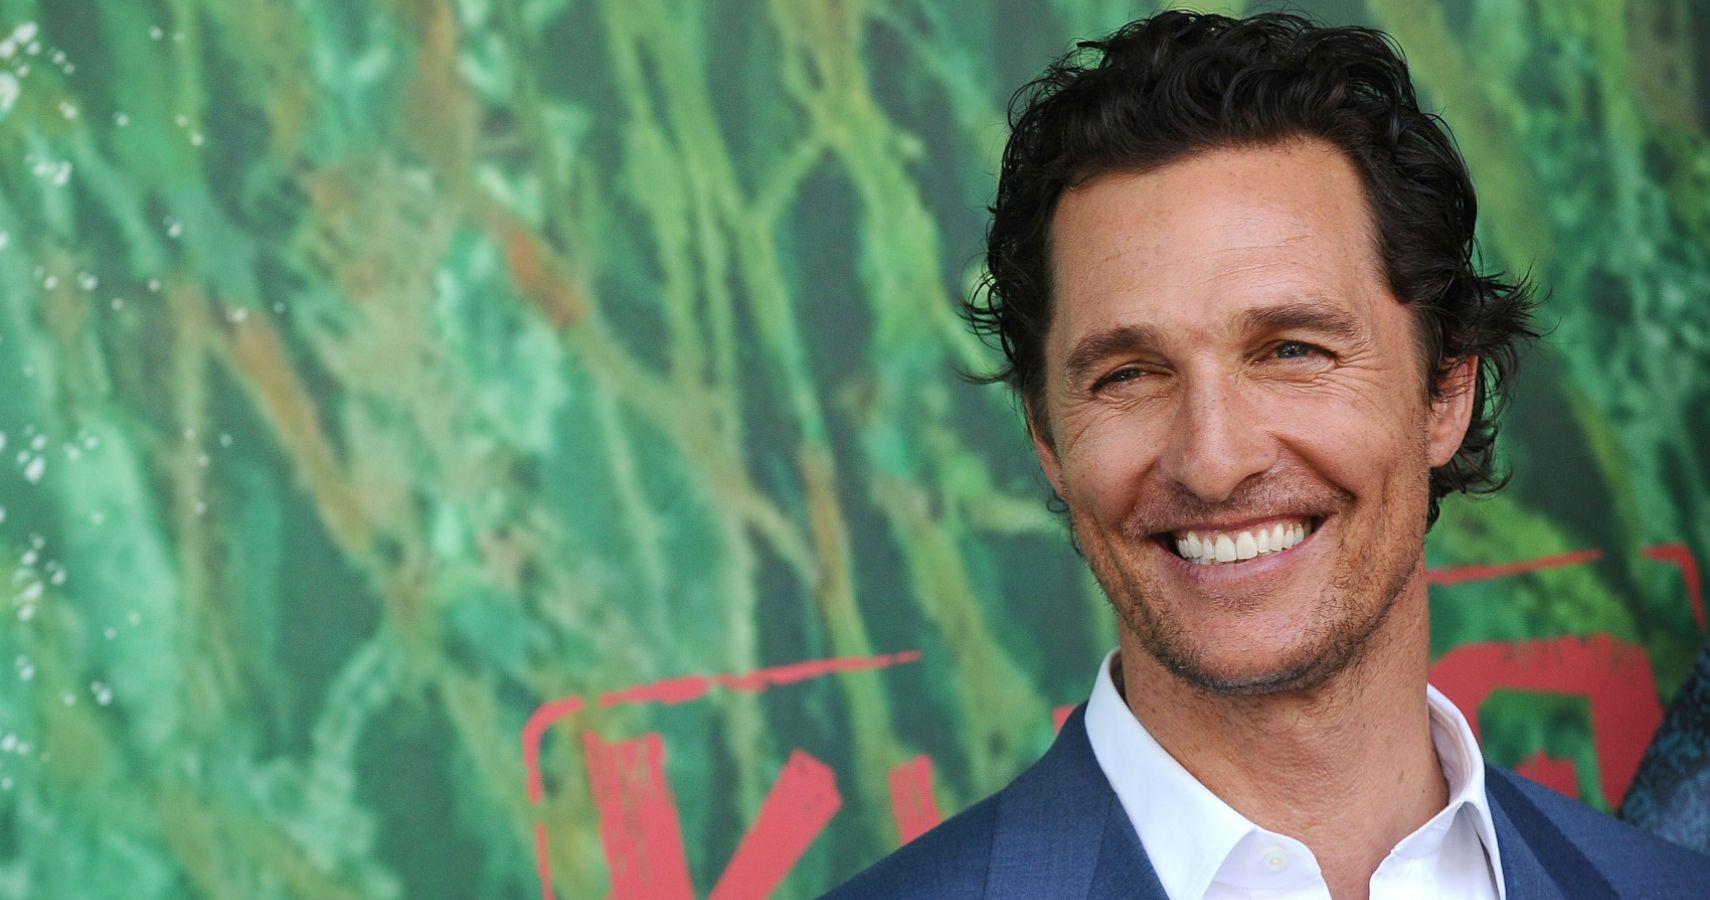 Matthew McConaughey Has a Secret Hobby, And It Involves Alcohol